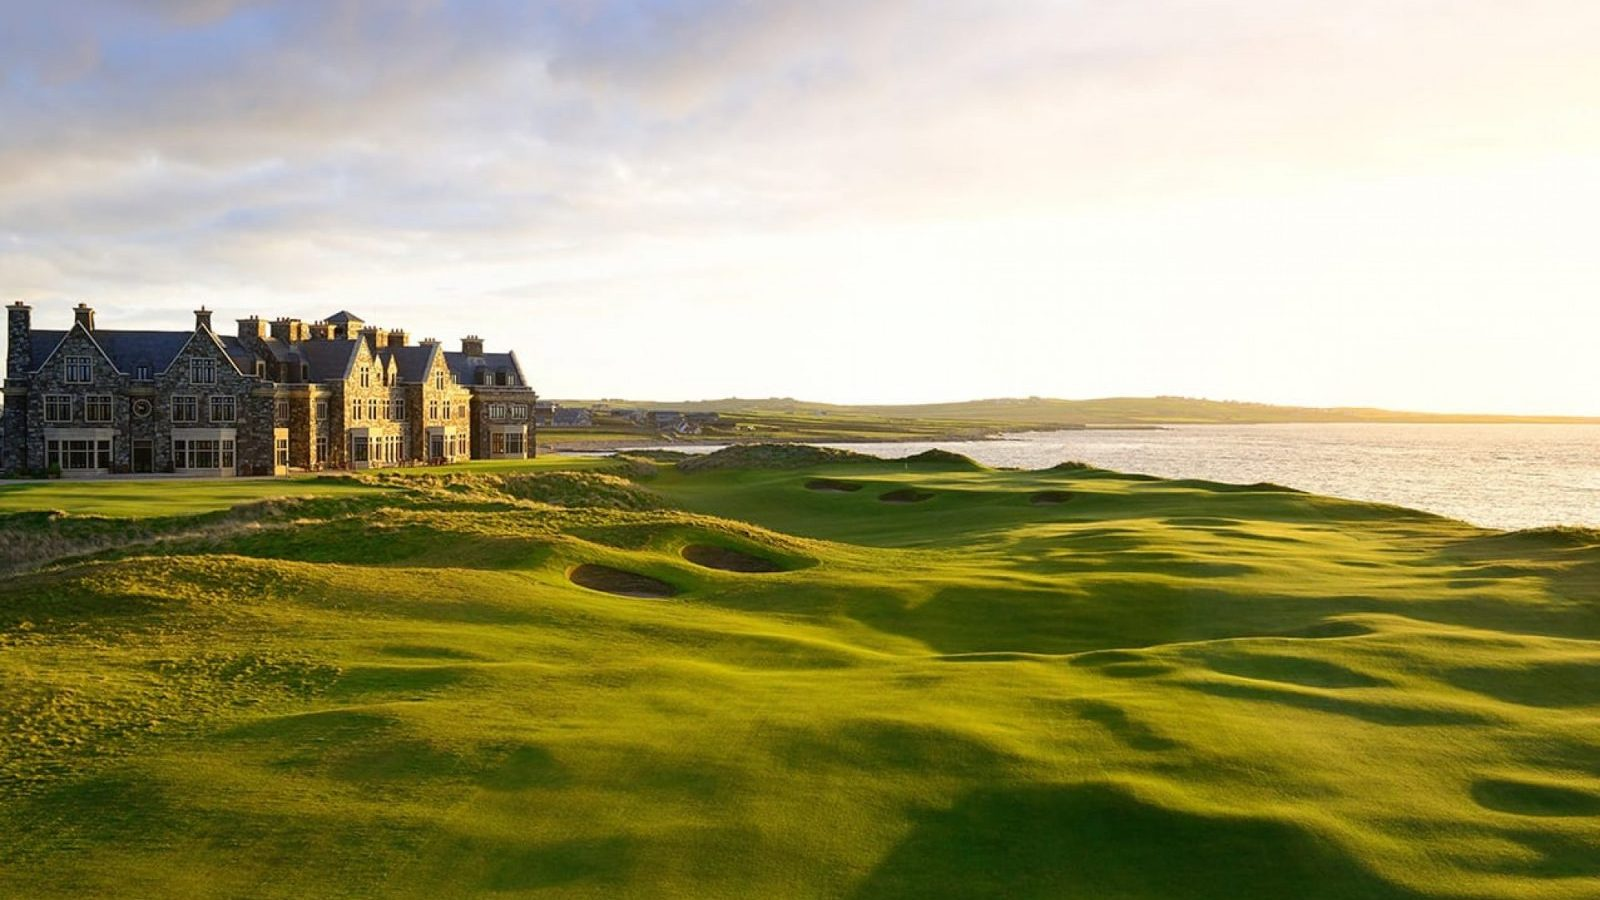 South-west-Ireland-Doonbeg-Resort-and-Golf-Course-1